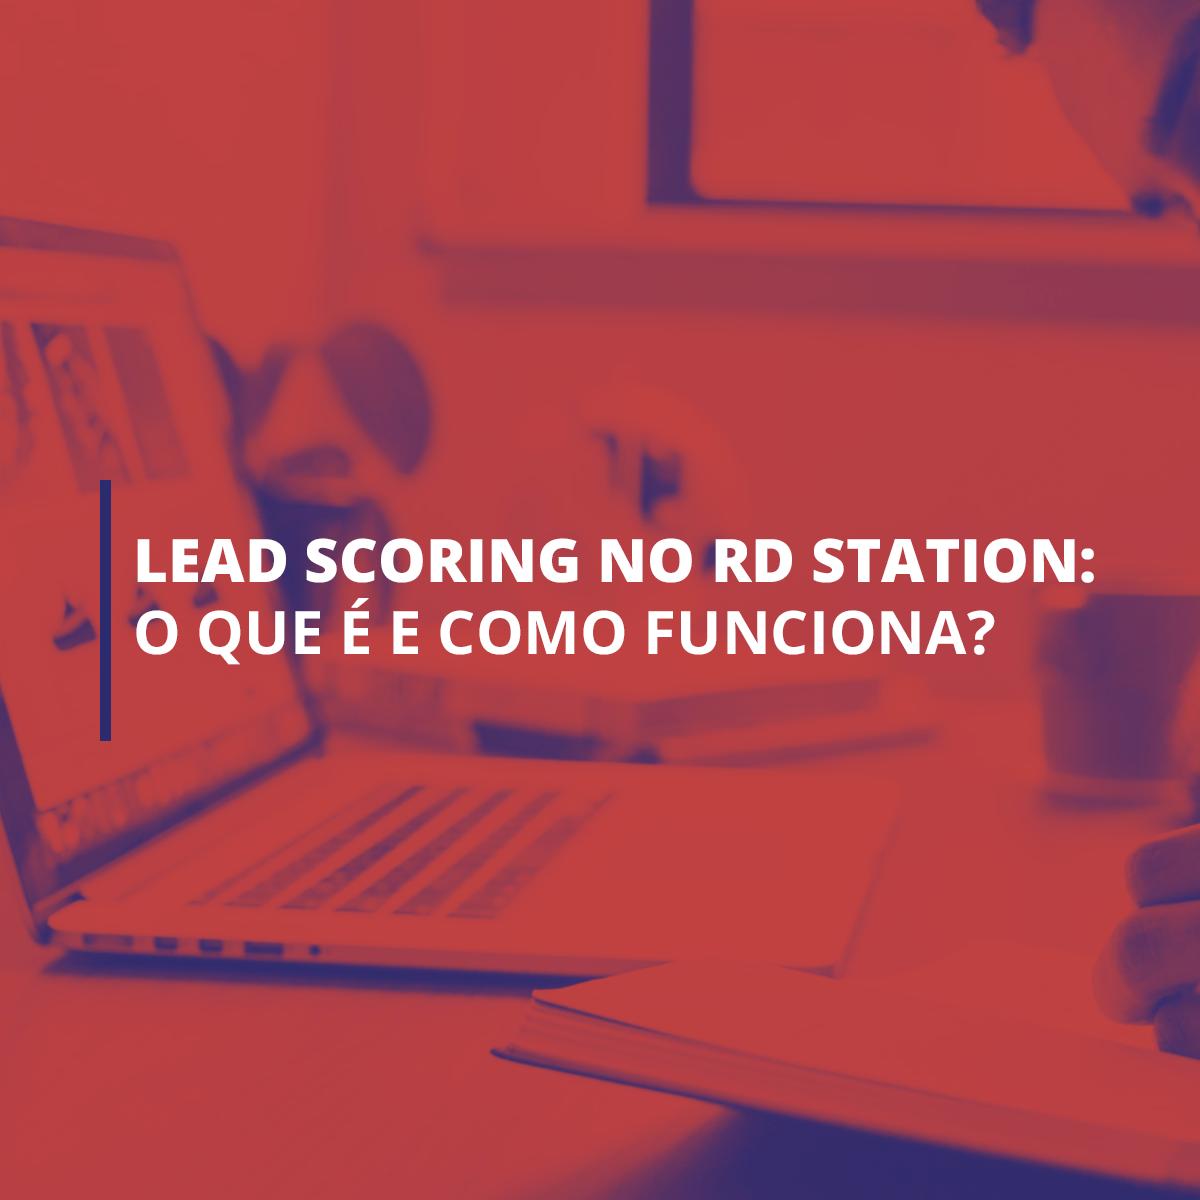 Lead scoring no RD Station: o que é e como funciona?